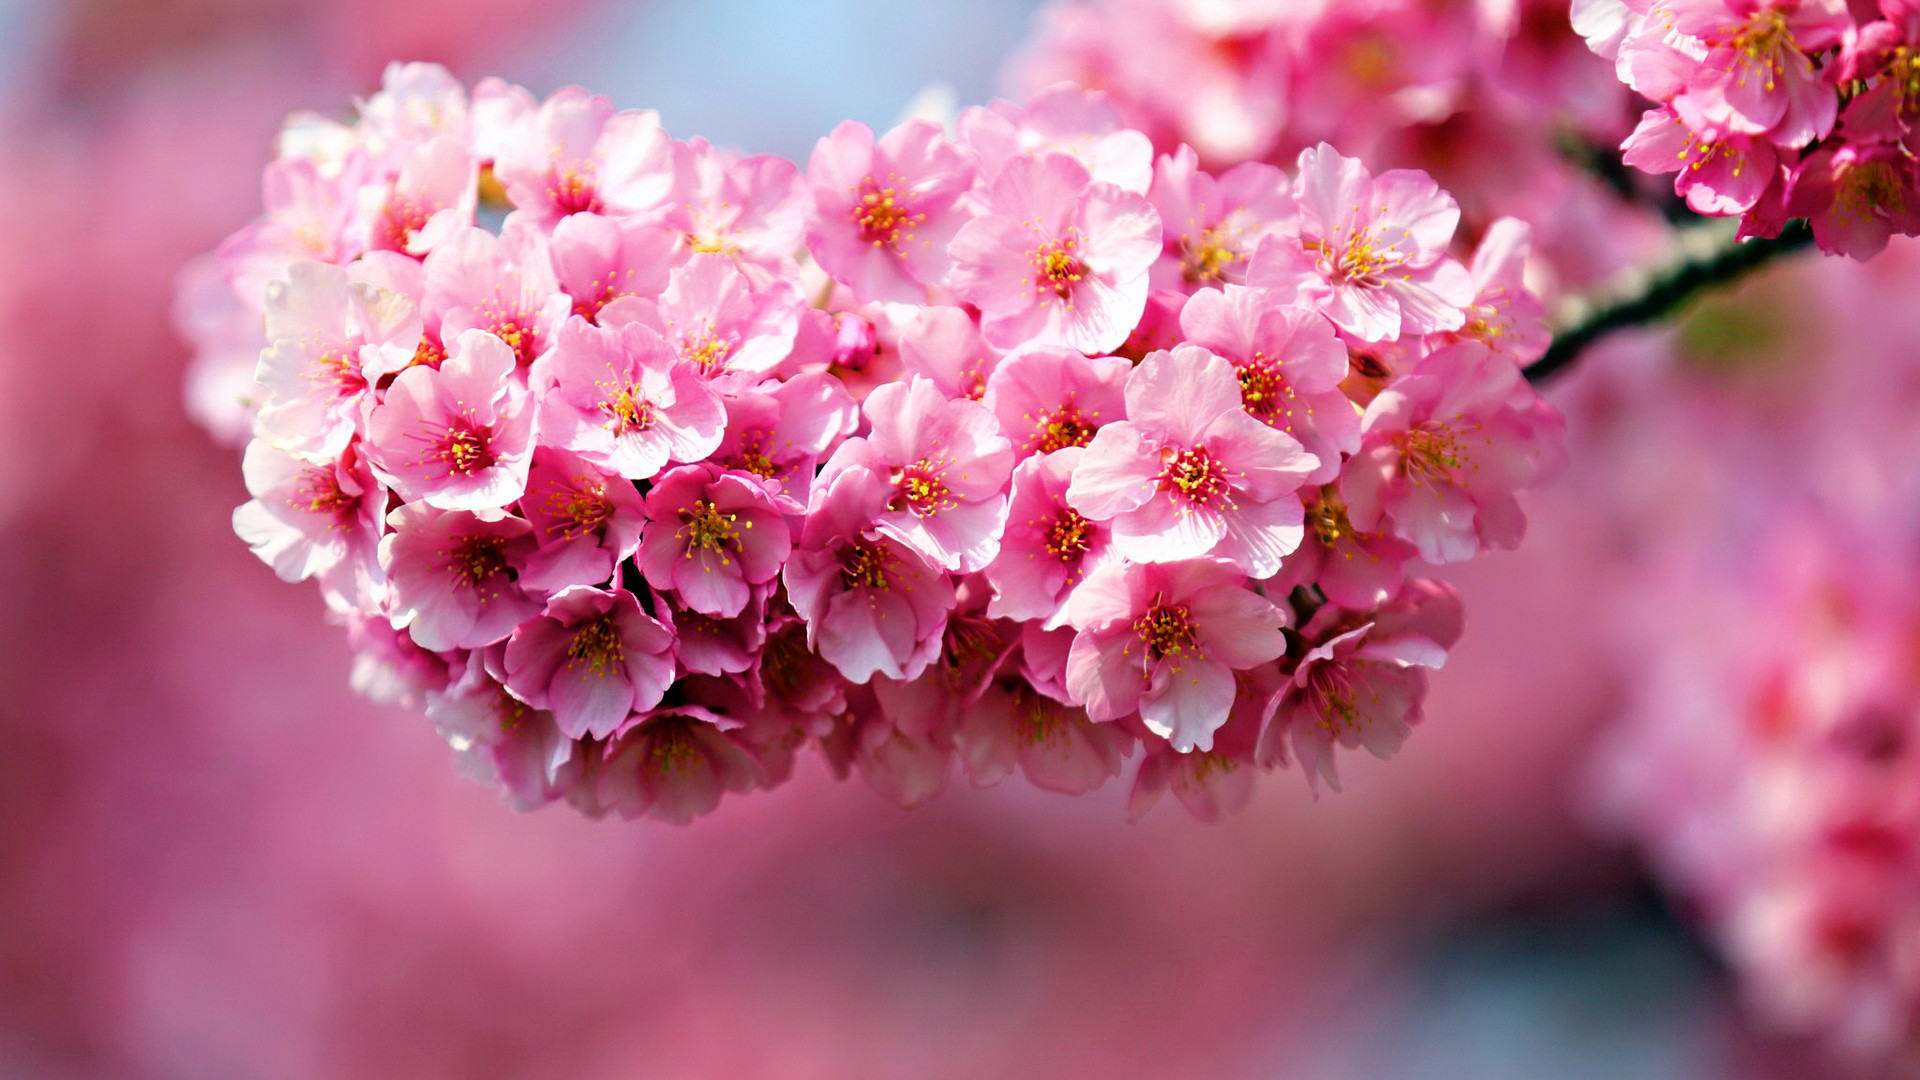 Best flower wallpapers for desktop flowers healthy flowers images desktop backgrounds mightylinksfo